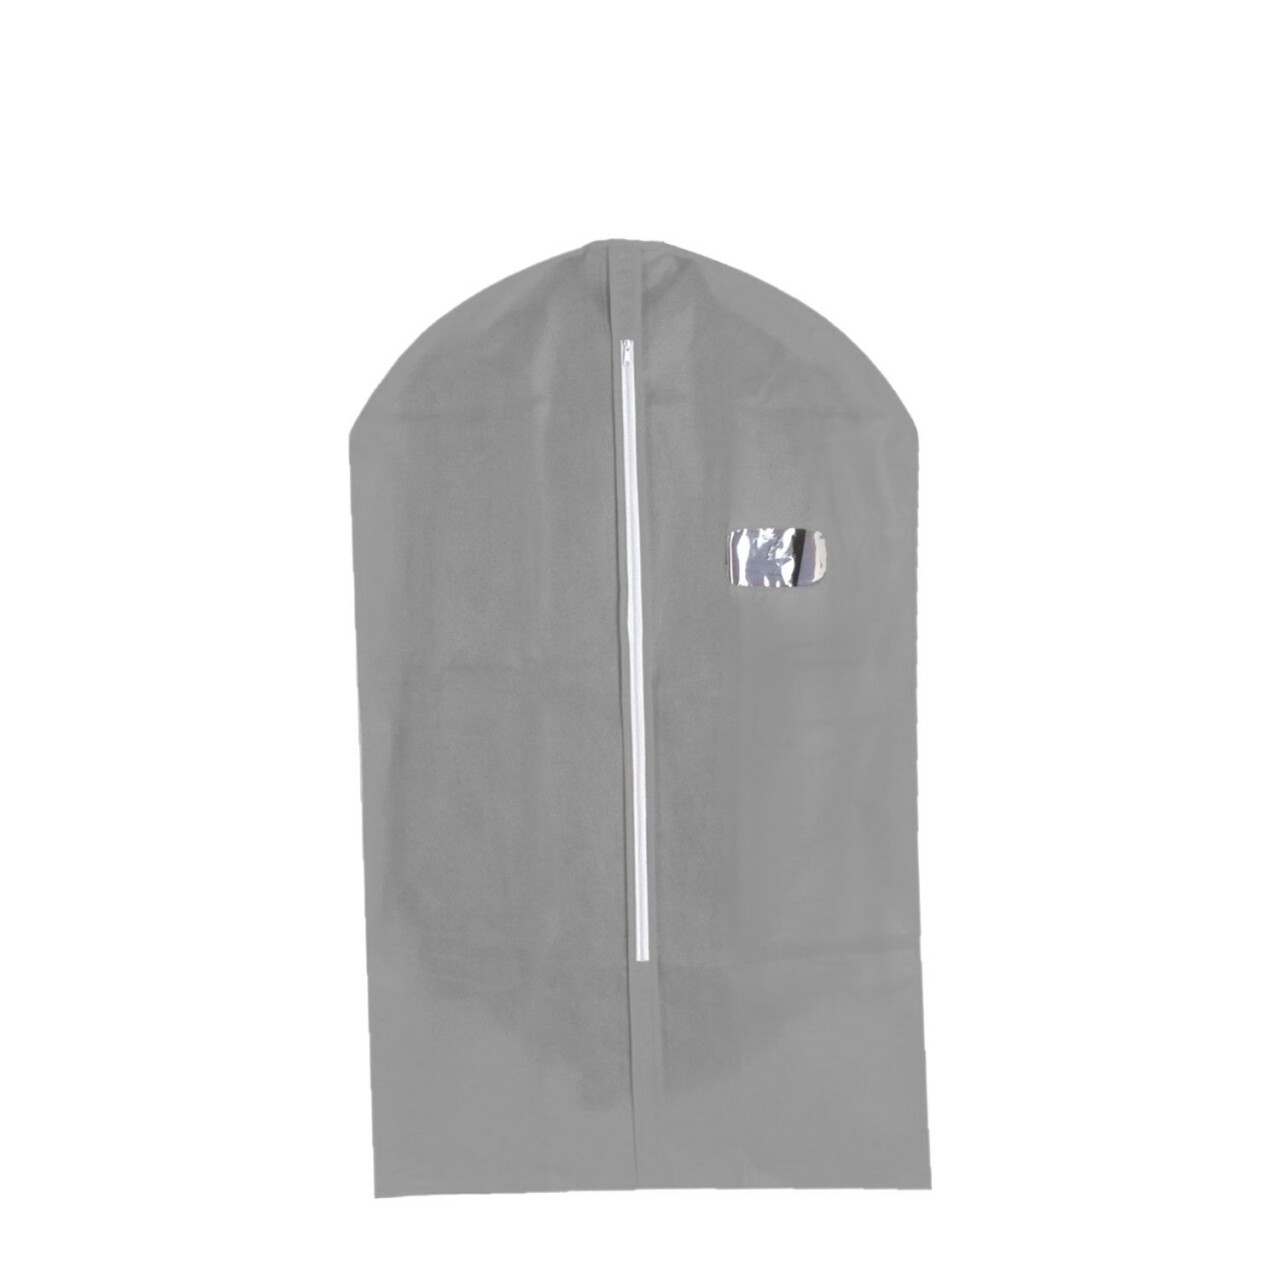 Husa pentru haine Grey, Jocca, 60x101 cm, PEVA, gri